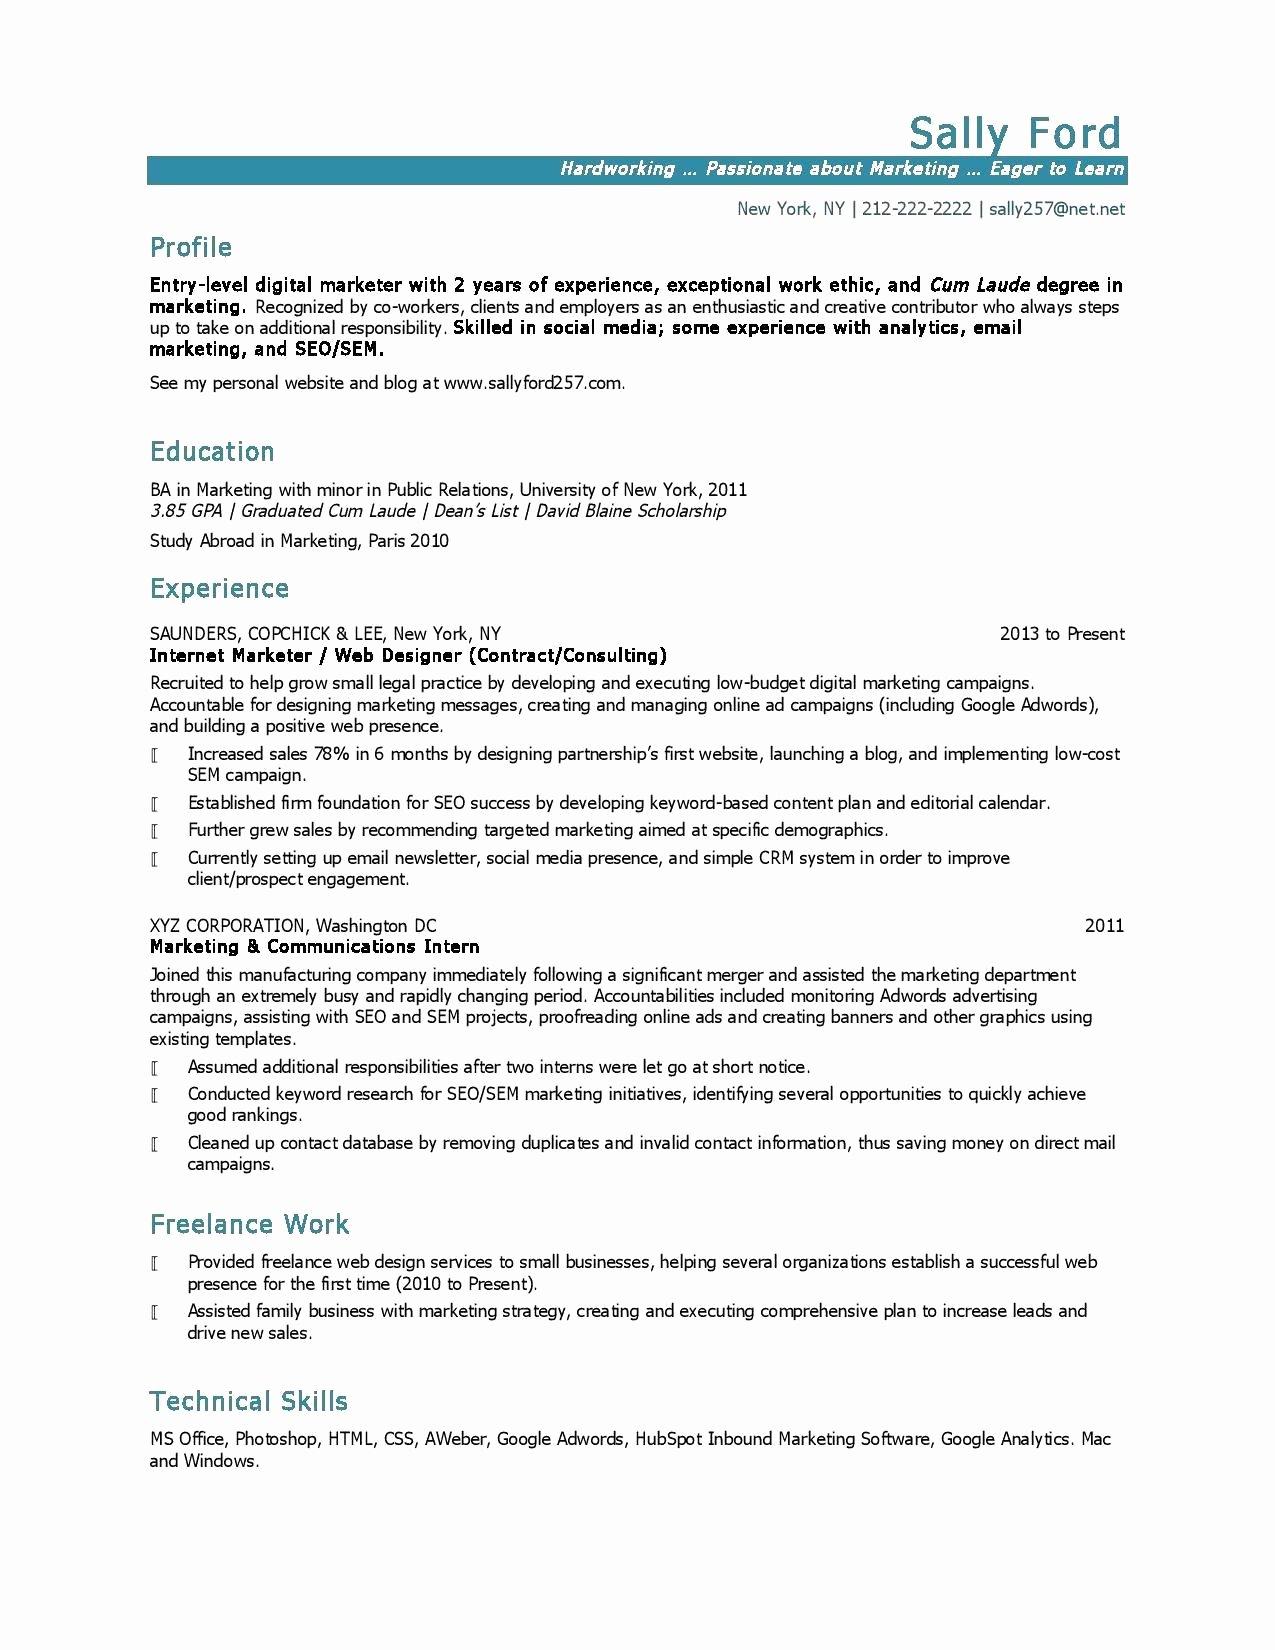 Entry Level Public Relations Resume Talktomartyb